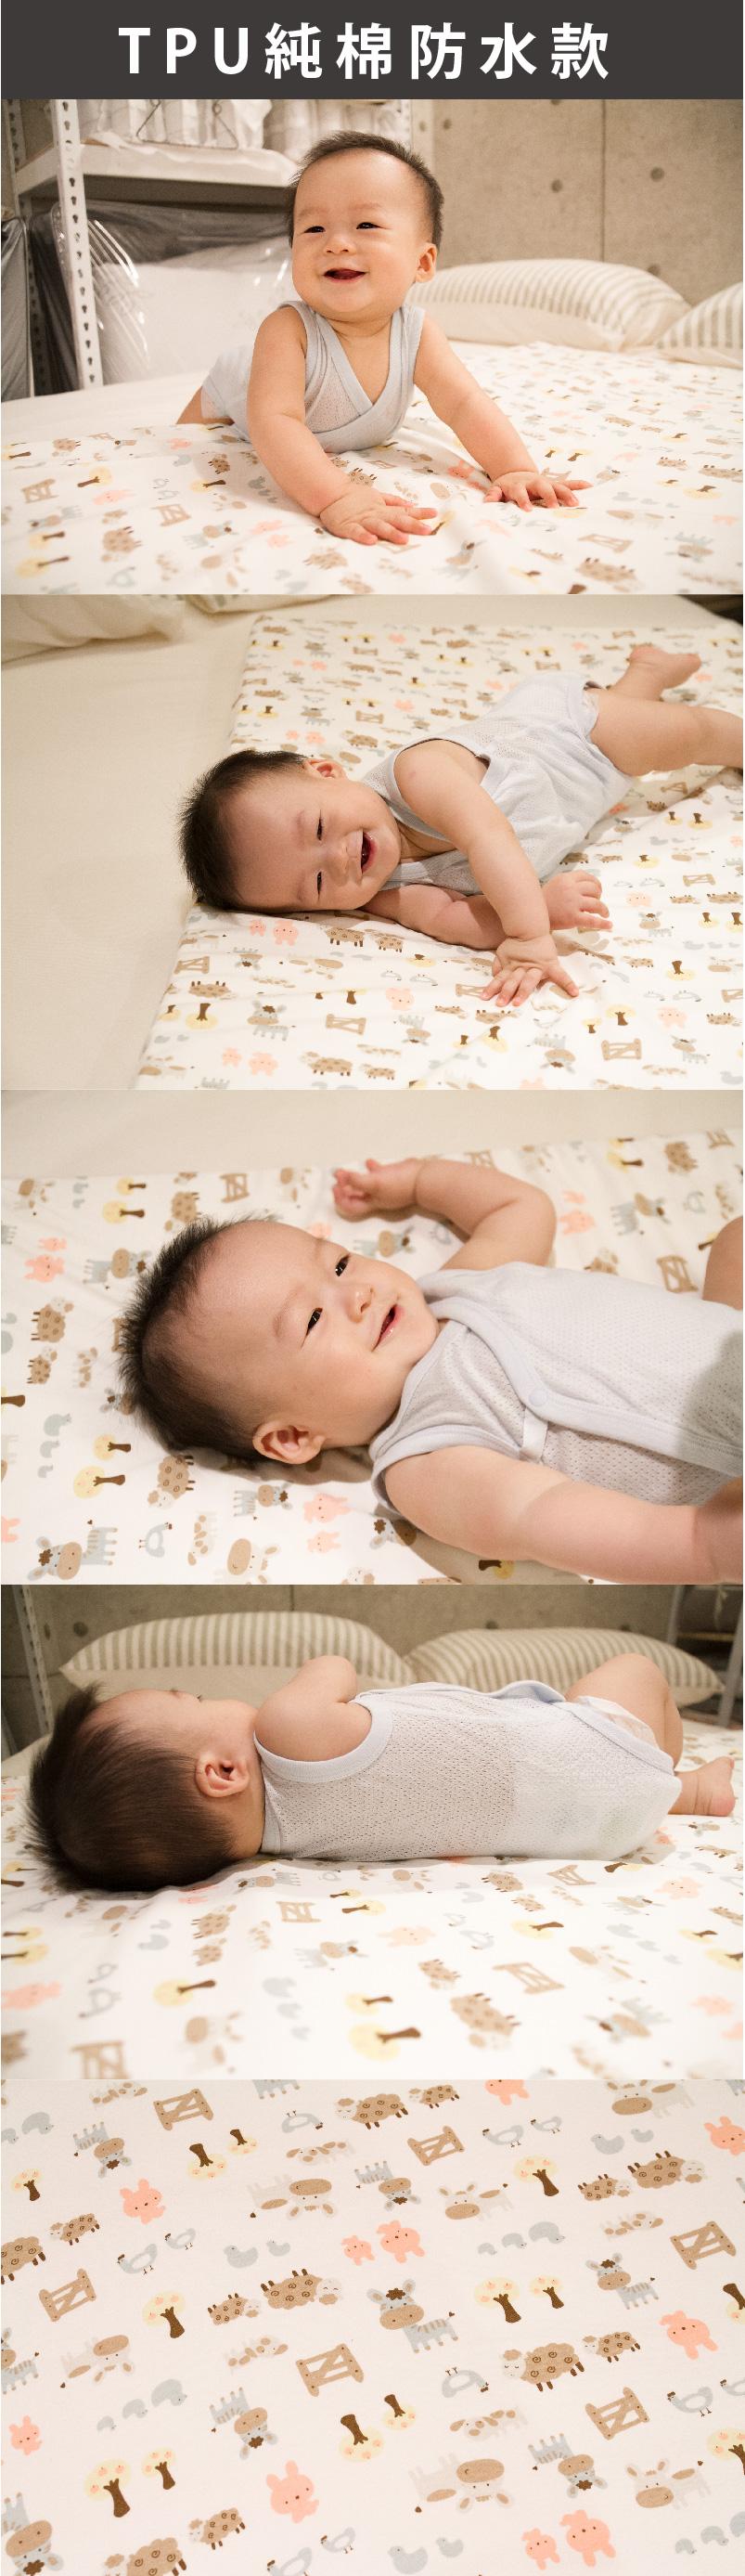 TPU純棉防水嬰兒乳膠床墊